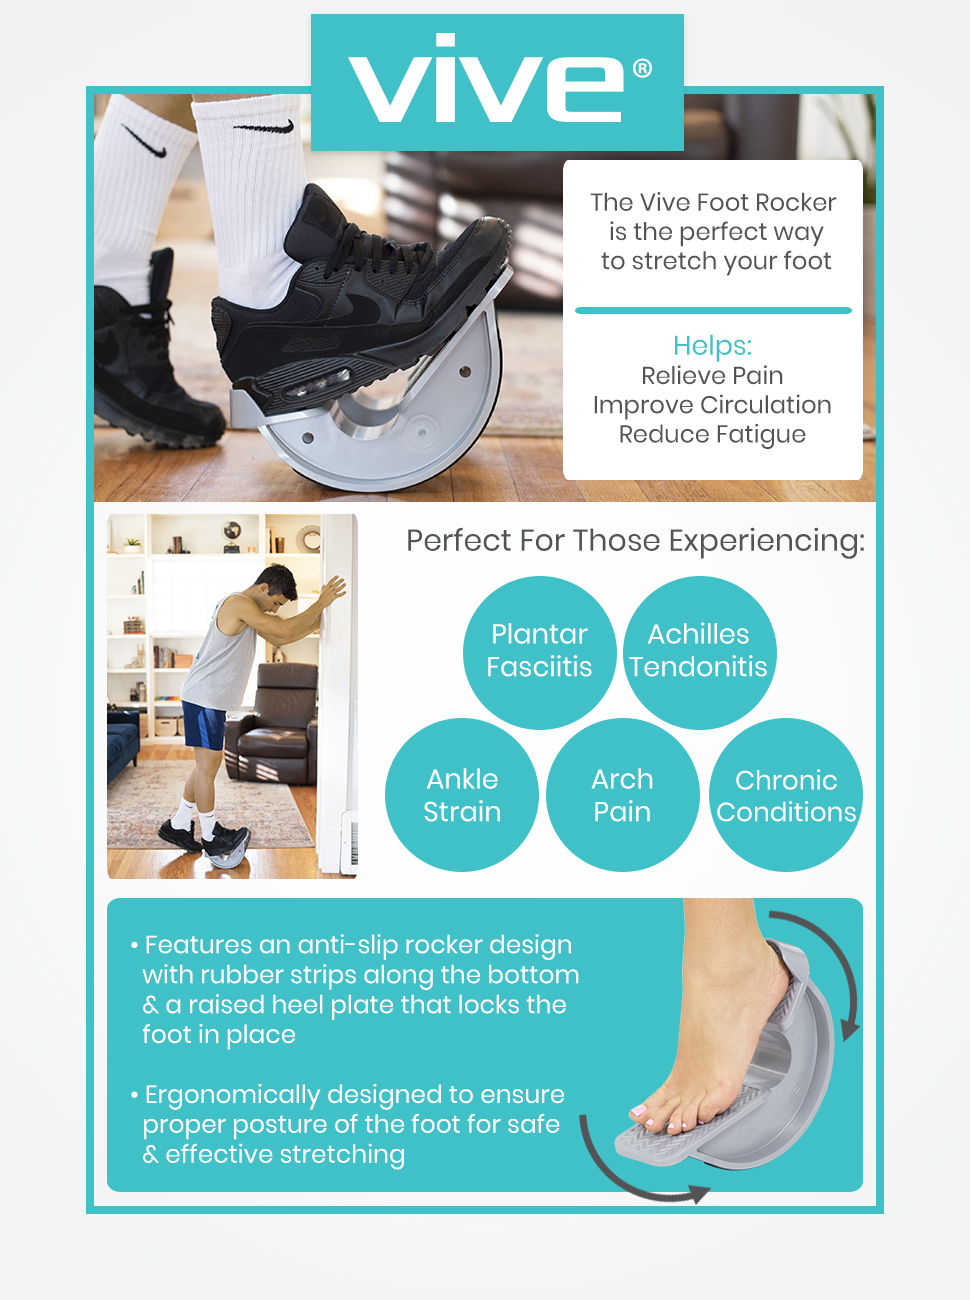 Vive Foot Rocker - Calf Stretcher for Achilles Tendinitis, Heel, Feet, Shin Splint, Plantar